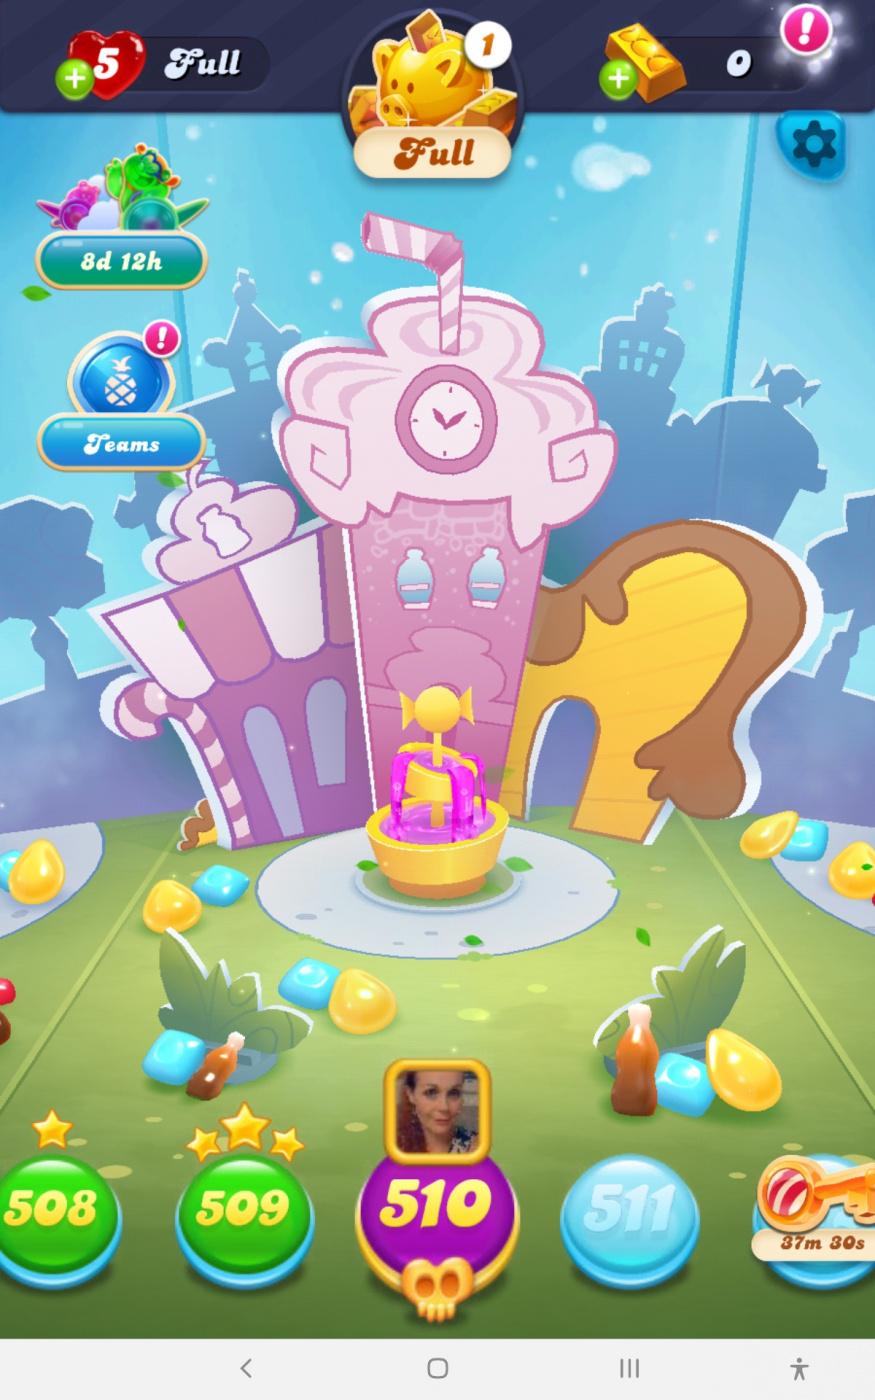 Screenshot_20210323-043931_Candy Crush Soda.jpg